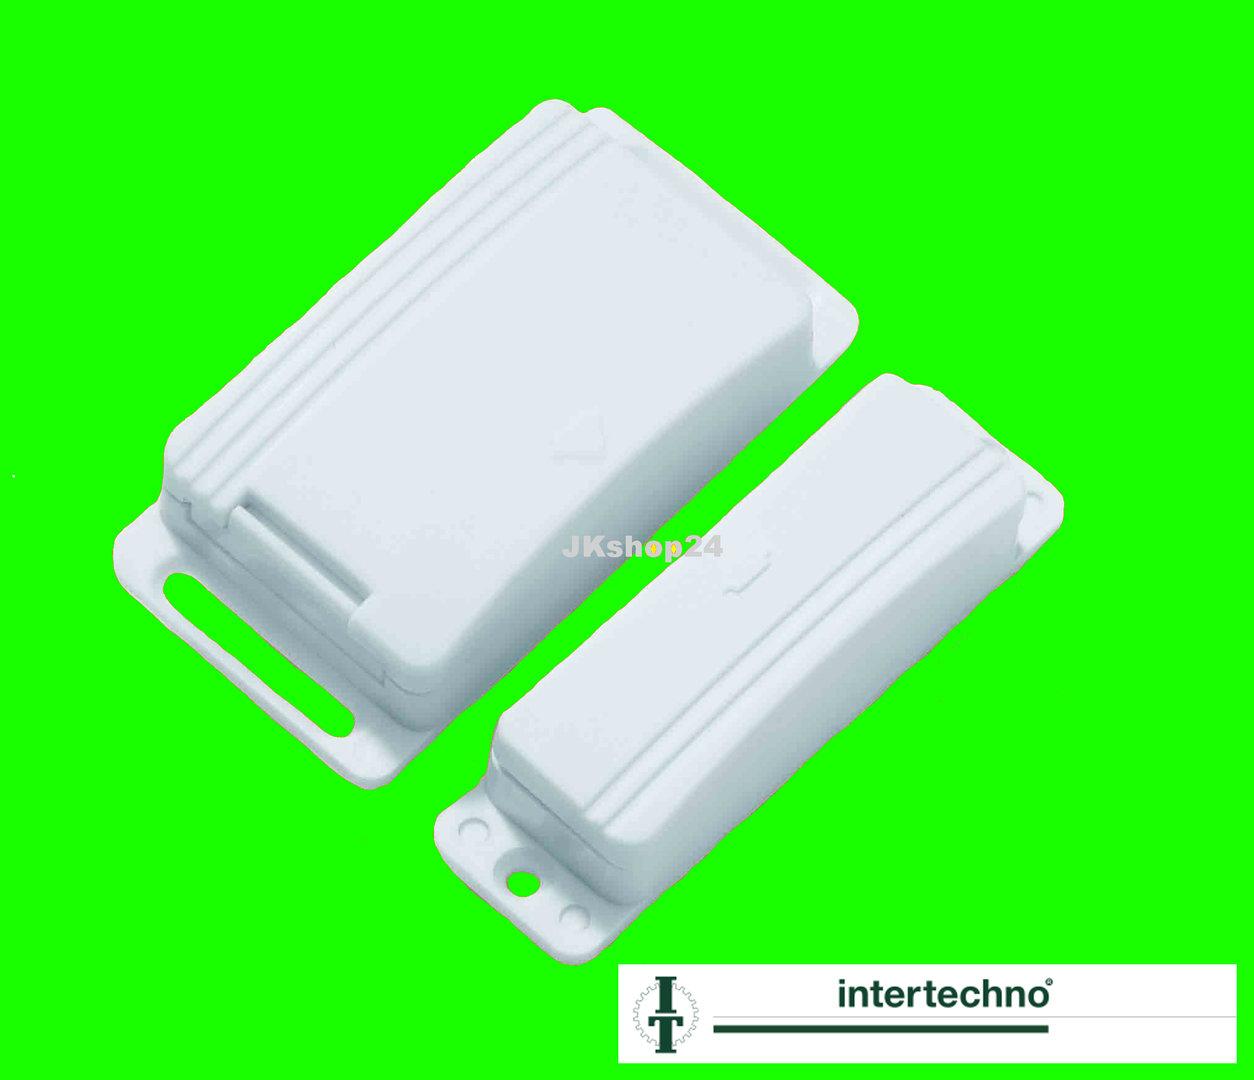 funk abluftsteuerung set intertechno fenster schalter set f r kamin ofen dunstabzug max 1500 watt. Black Bedroom Furniture Sets. Home Design Ideas